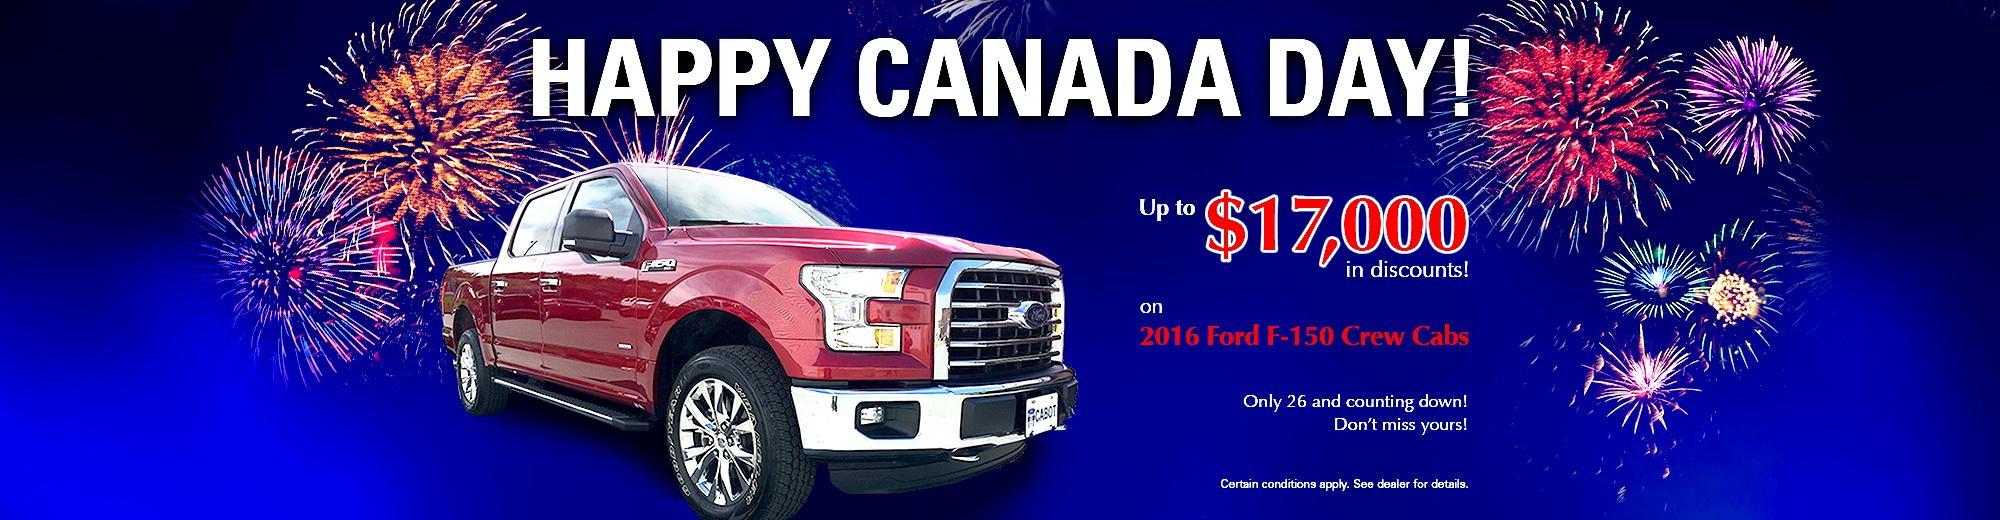 2016 Ford F150 Crew Cab incentive